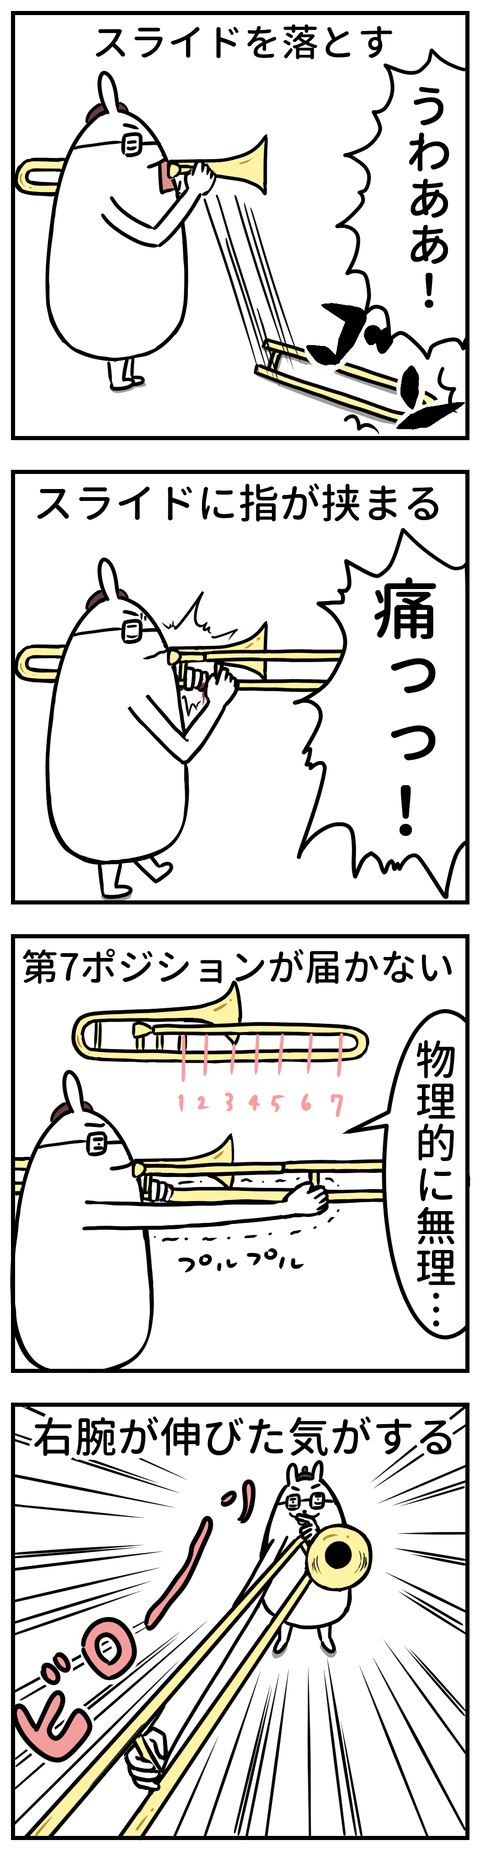 manga-yuzuporo86-1